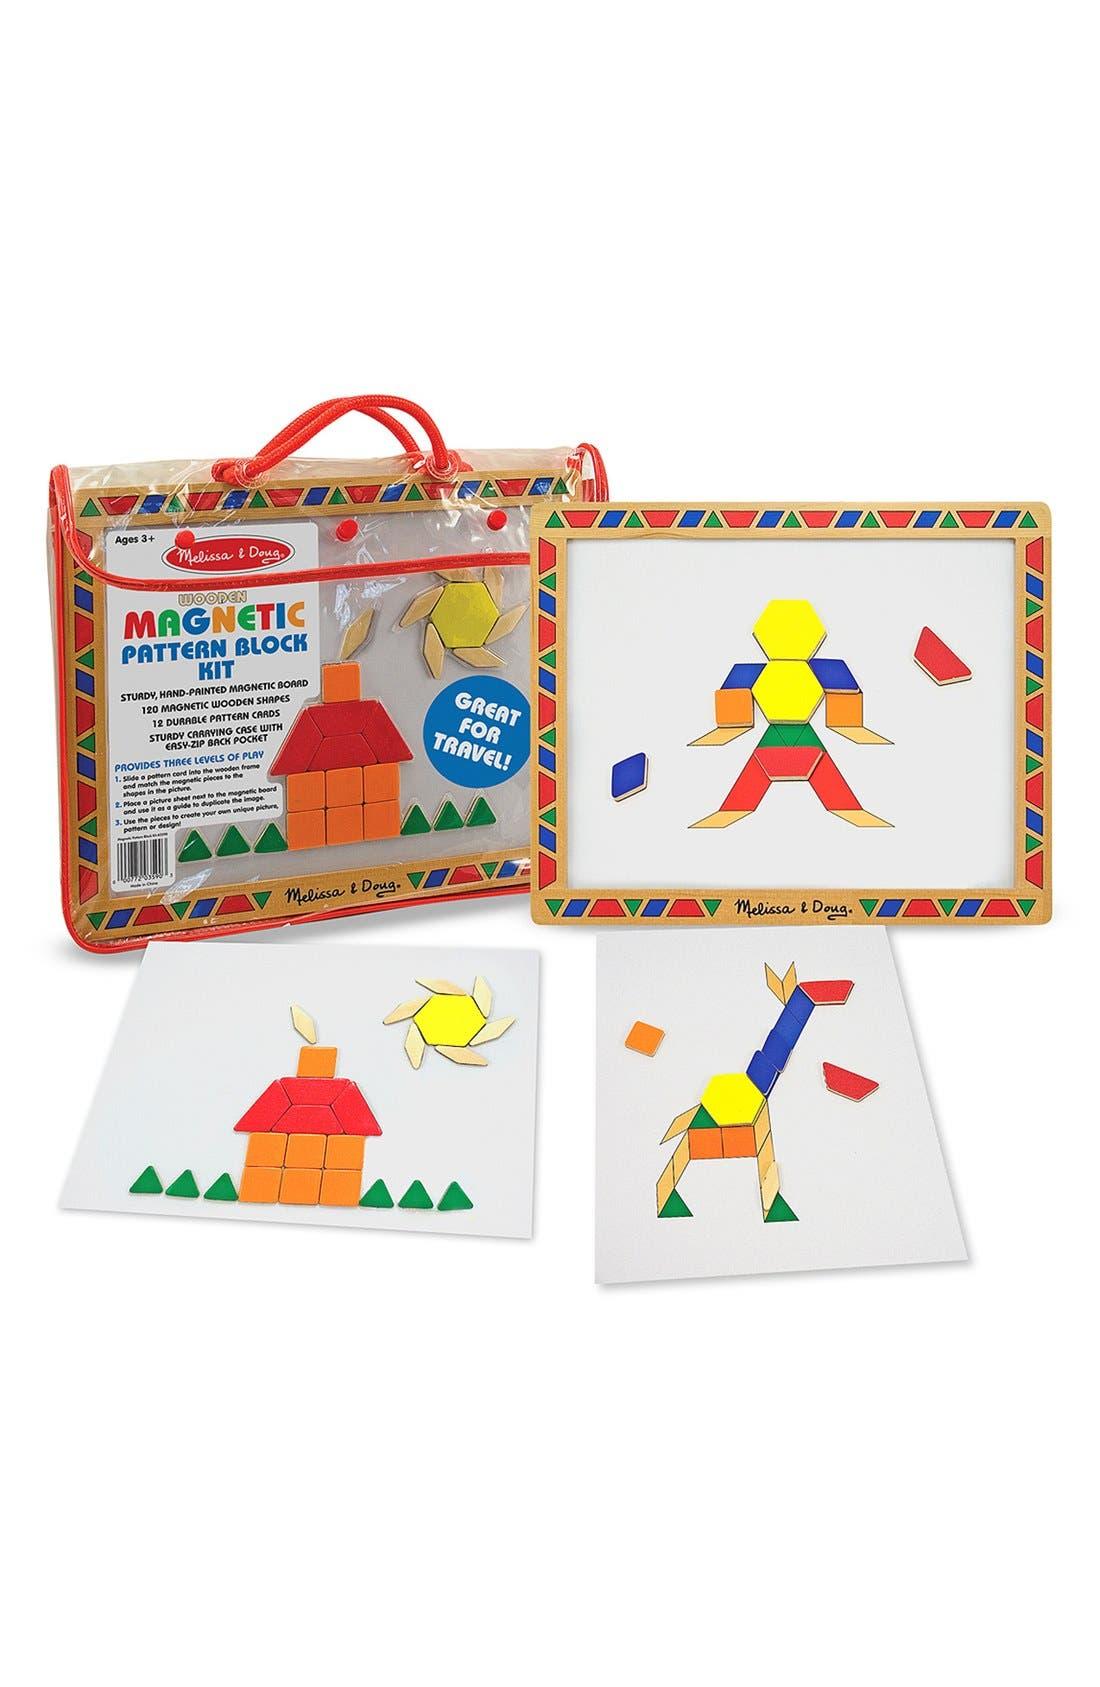 Melissa & Doug Magnetic Pattern Block Kit